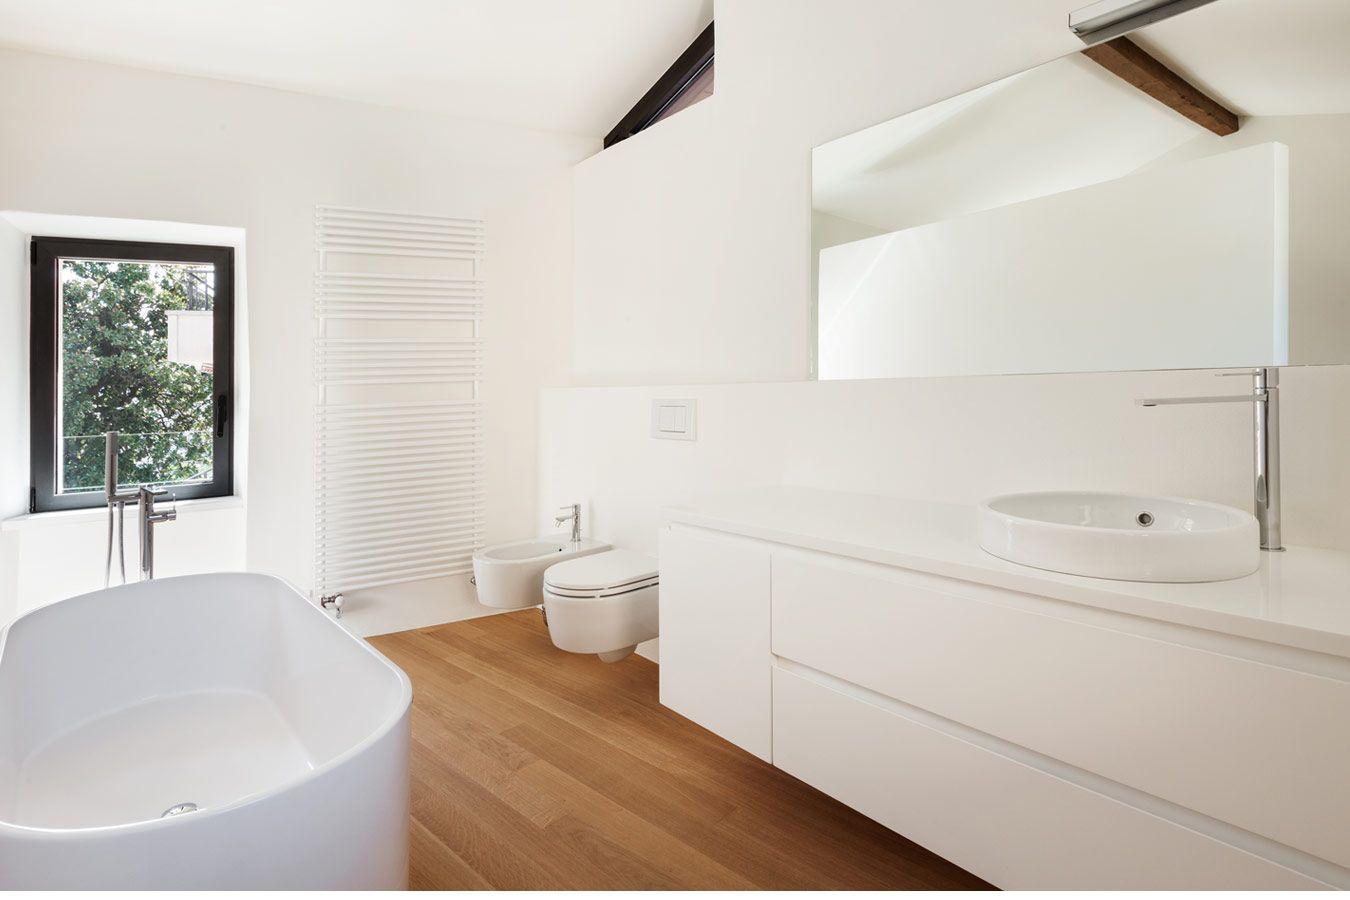 Hedendaags Wit tijdloos badkamermeubel met houten vloer | Badkamer laminaat AI-46